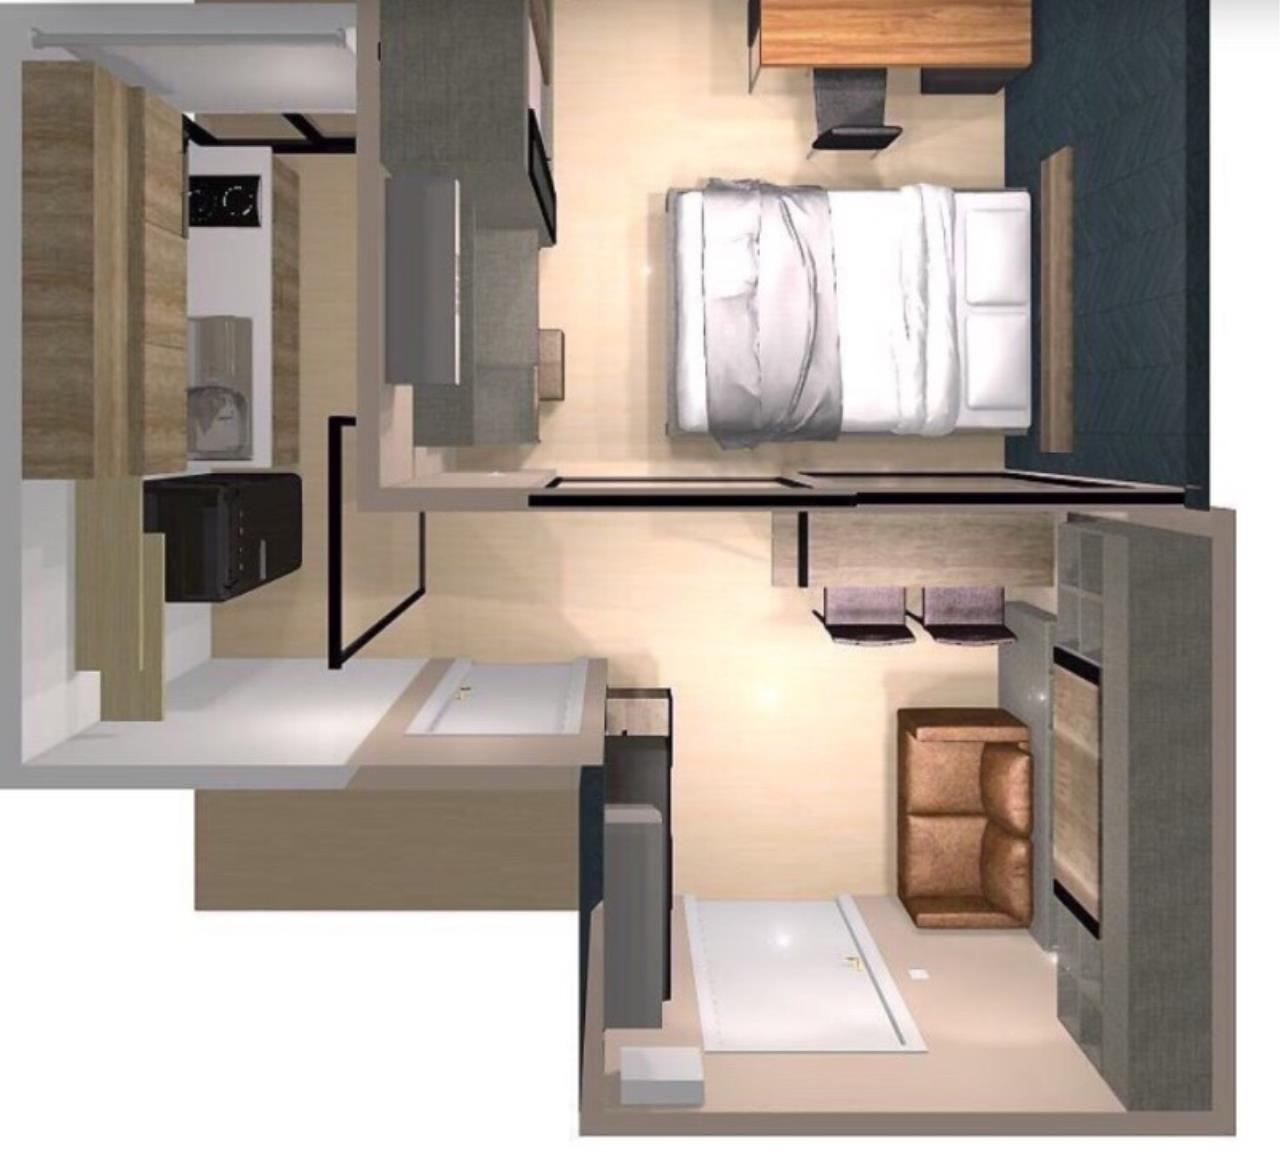 Century21 Skylux Agency's Life Asoke / Condo For Sale / 1 Bedroom / 30 SQM / MRT Phetchaburi / Bangkok 2